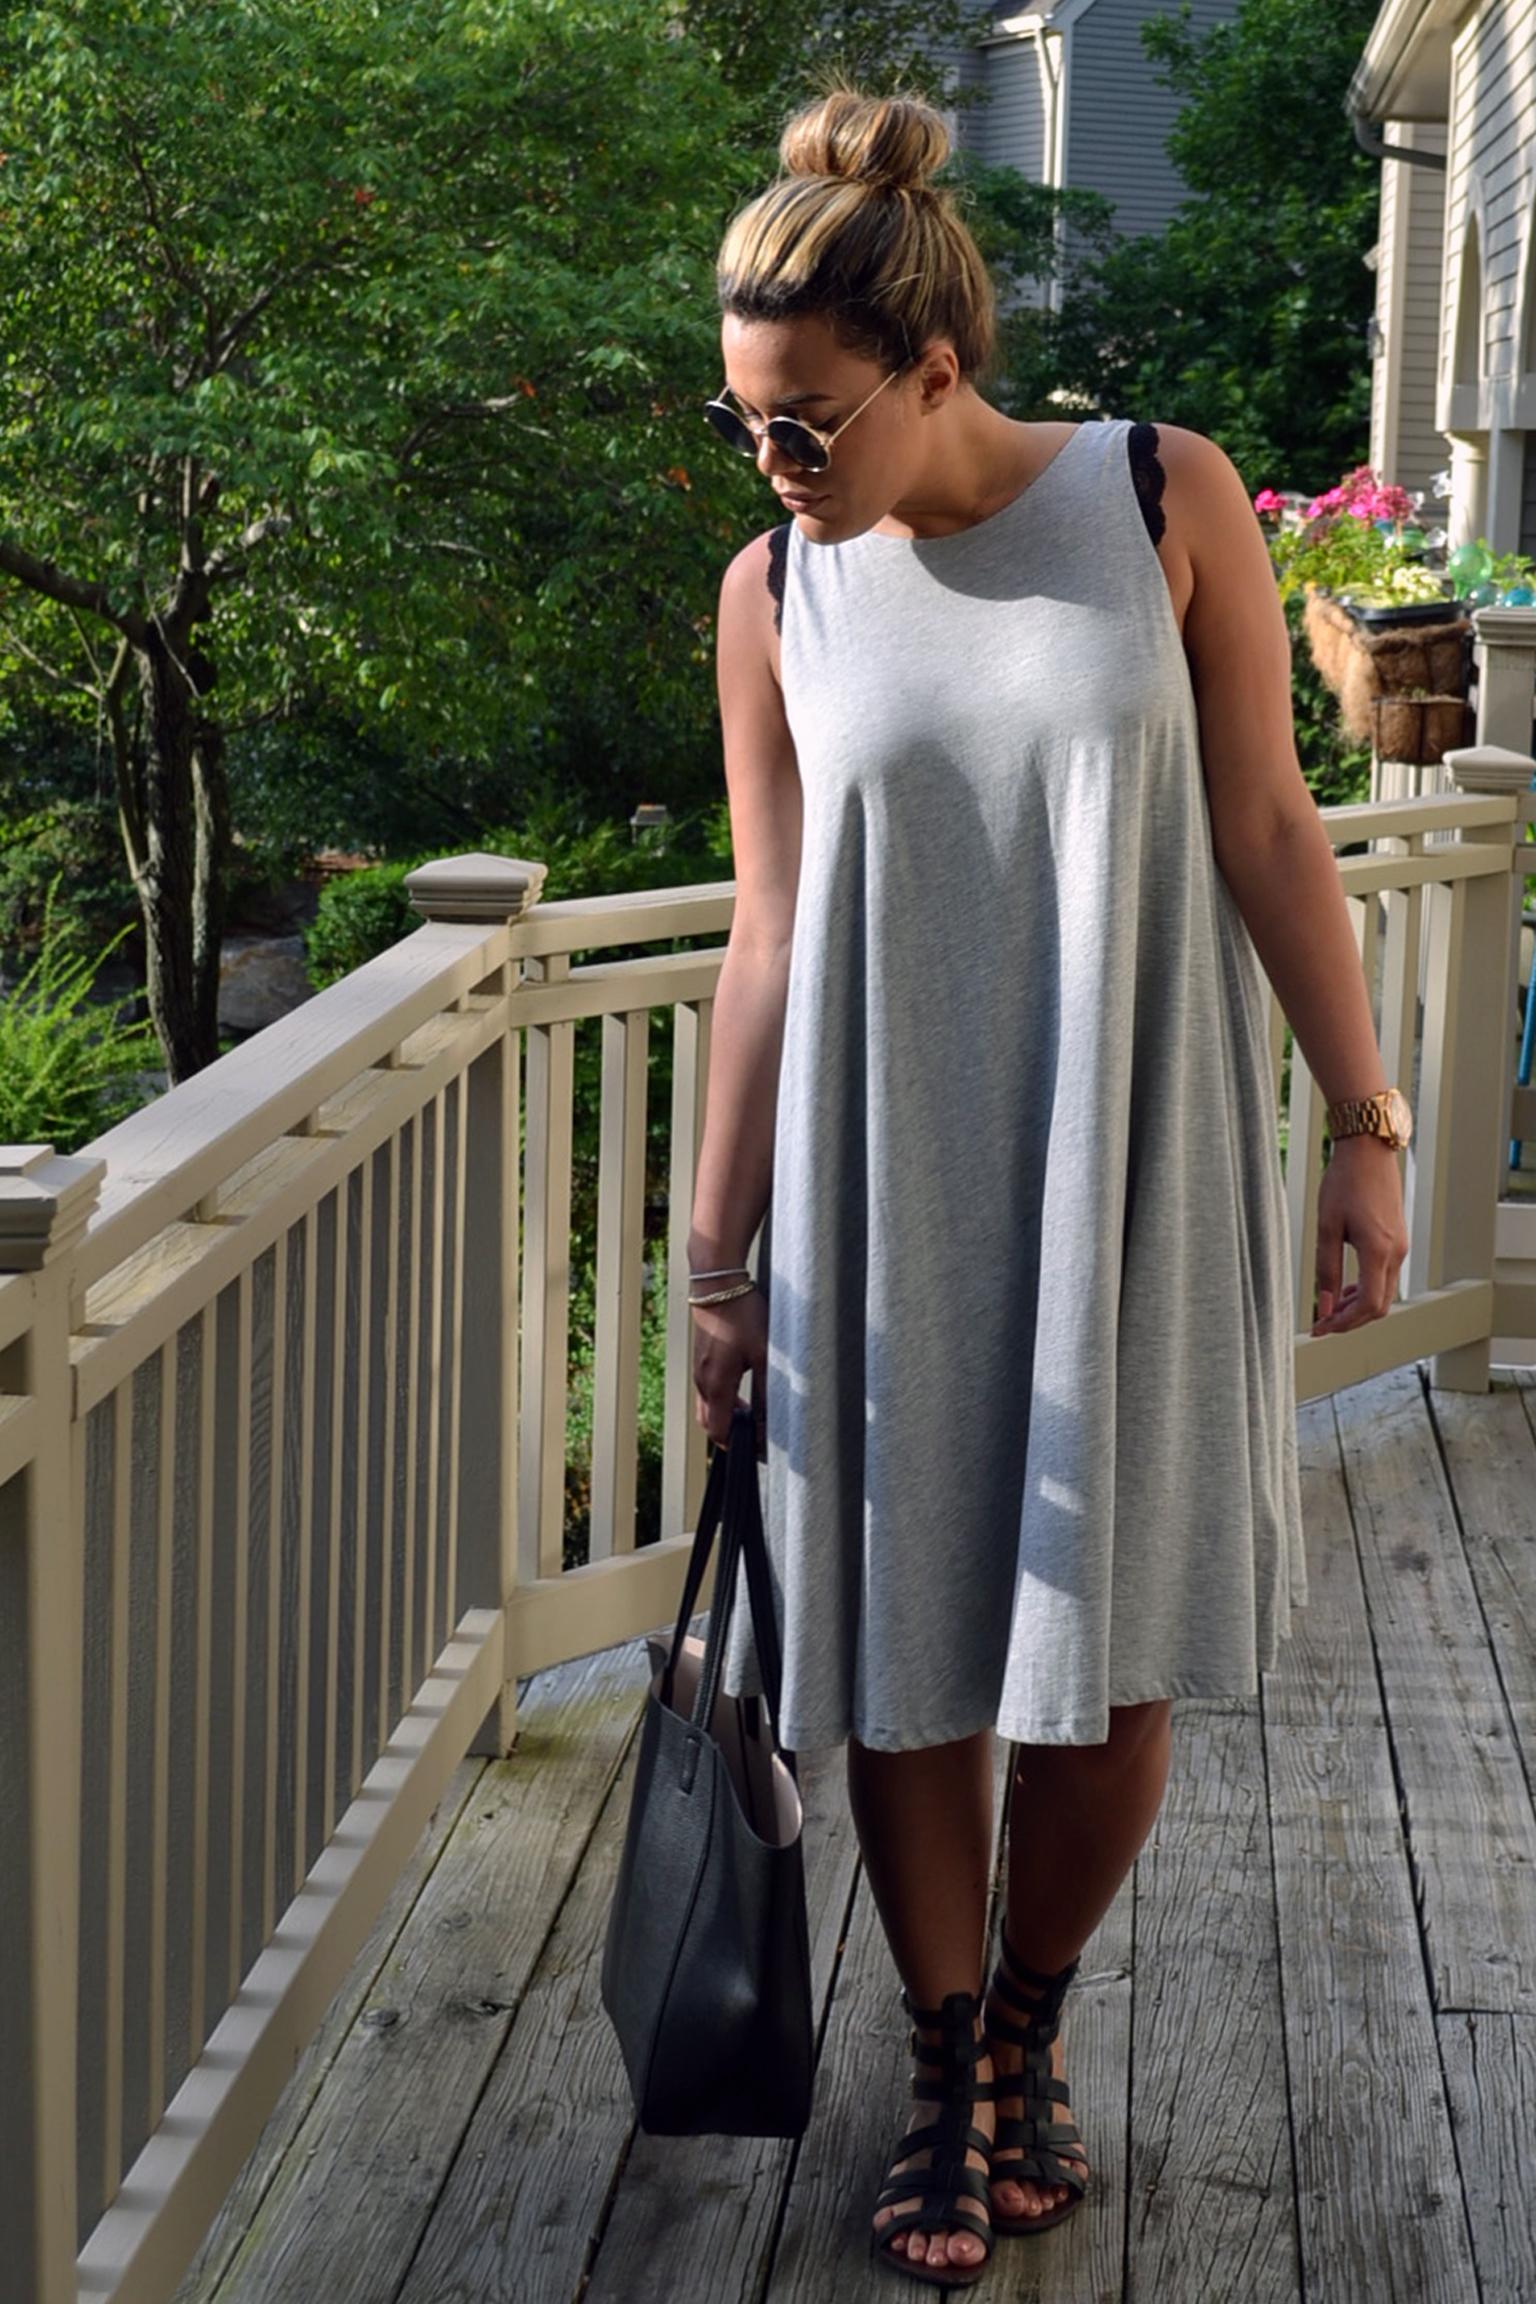 how-to-wear-low-cut-back-dress-lace-bralette-gladiator-sandals.jpg